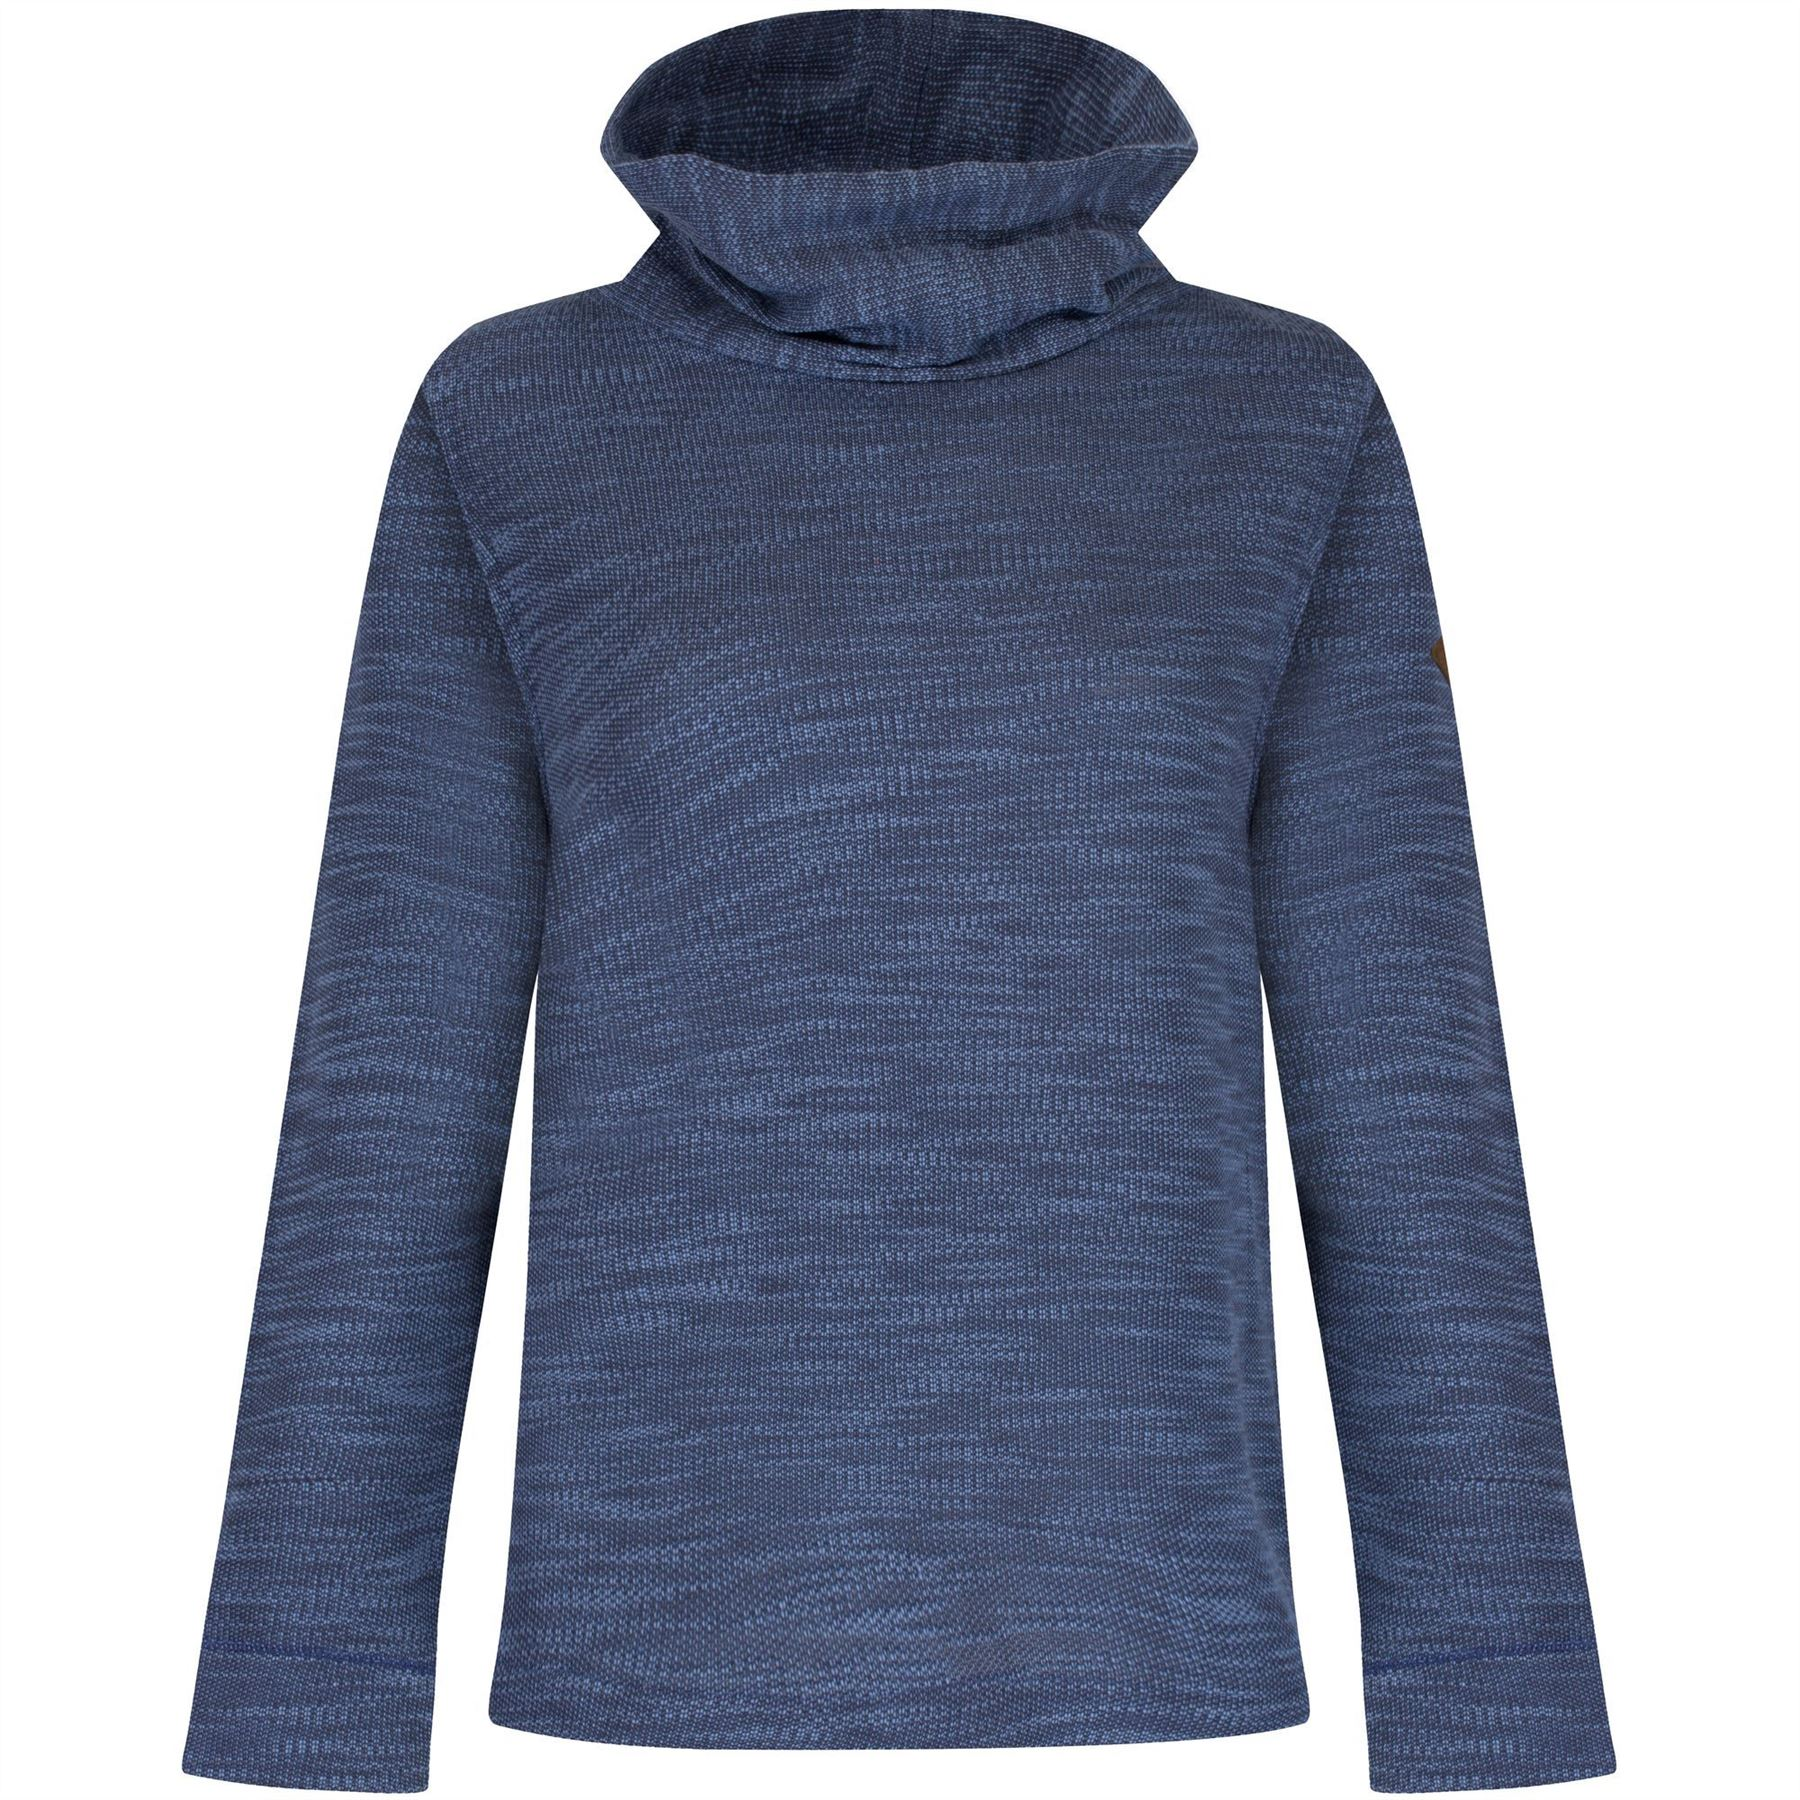 Regatta-Ceanna-Cowl-Neck-Soft-Fleece-Pull-Over-Jumper-Sweater-Top-RWA276 thumbnail 6